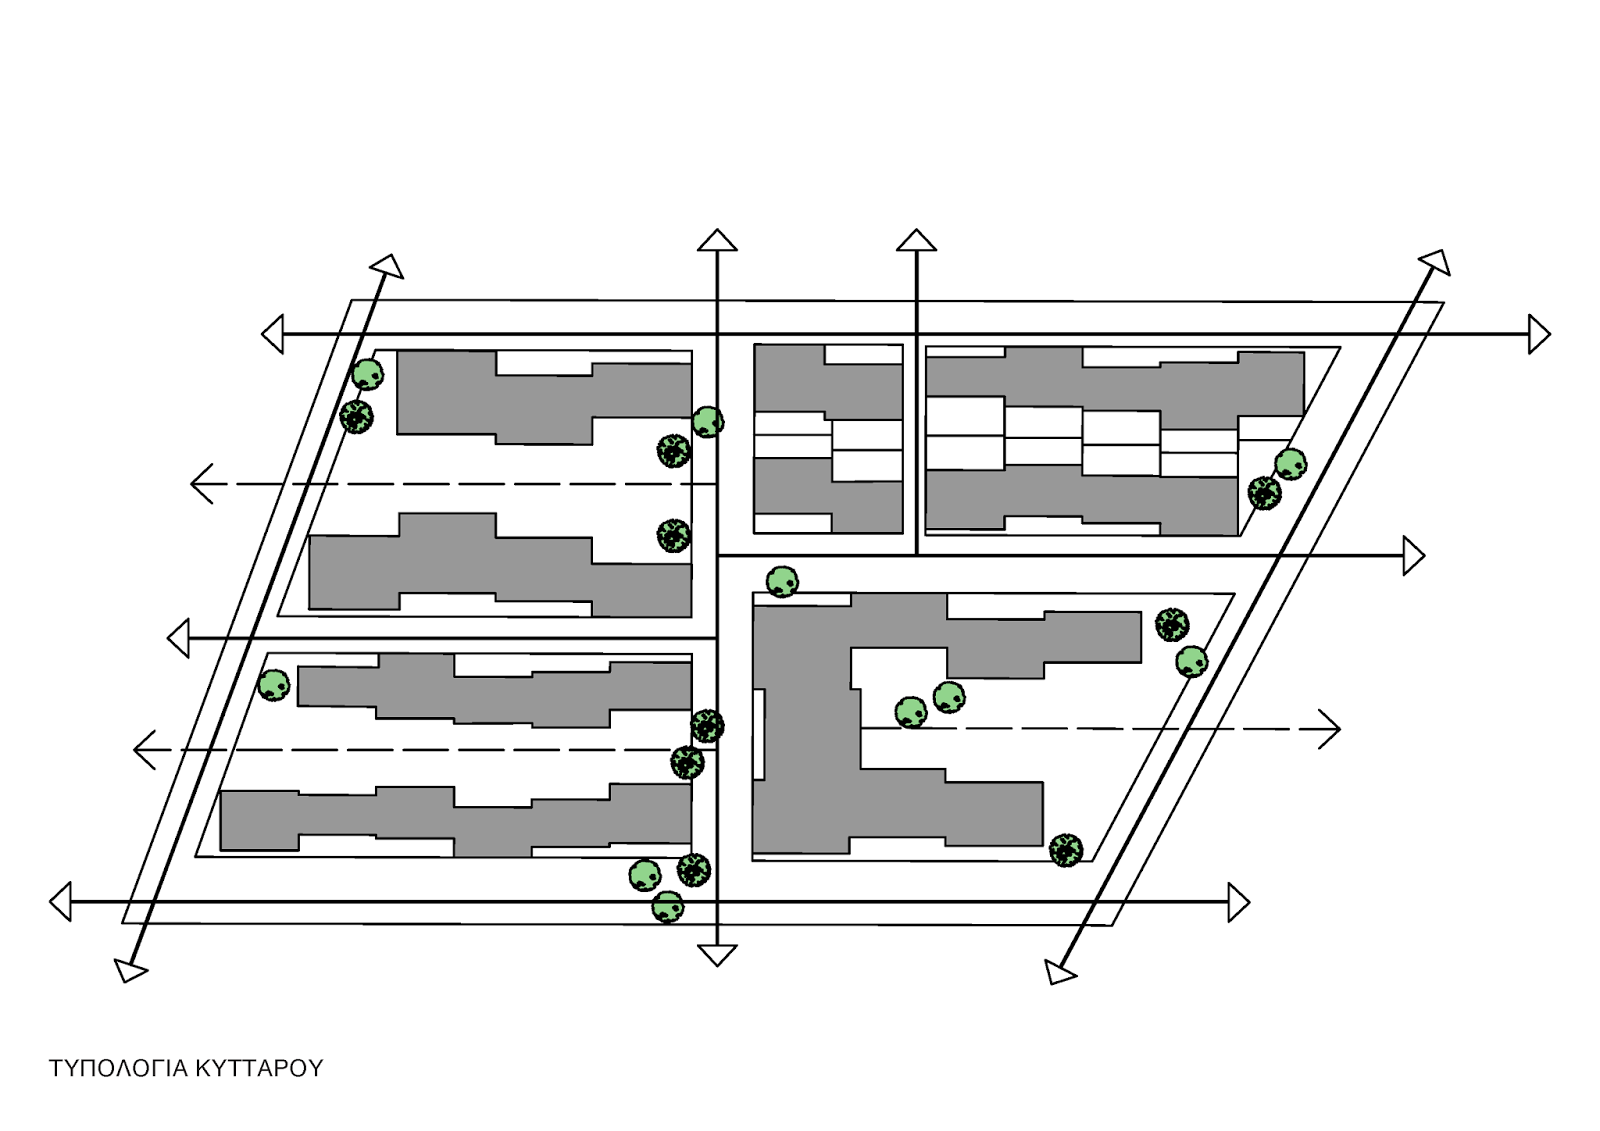 Mini Cooper Navigation Wiring Diagram : Mini cooper navigation wiring diagram start